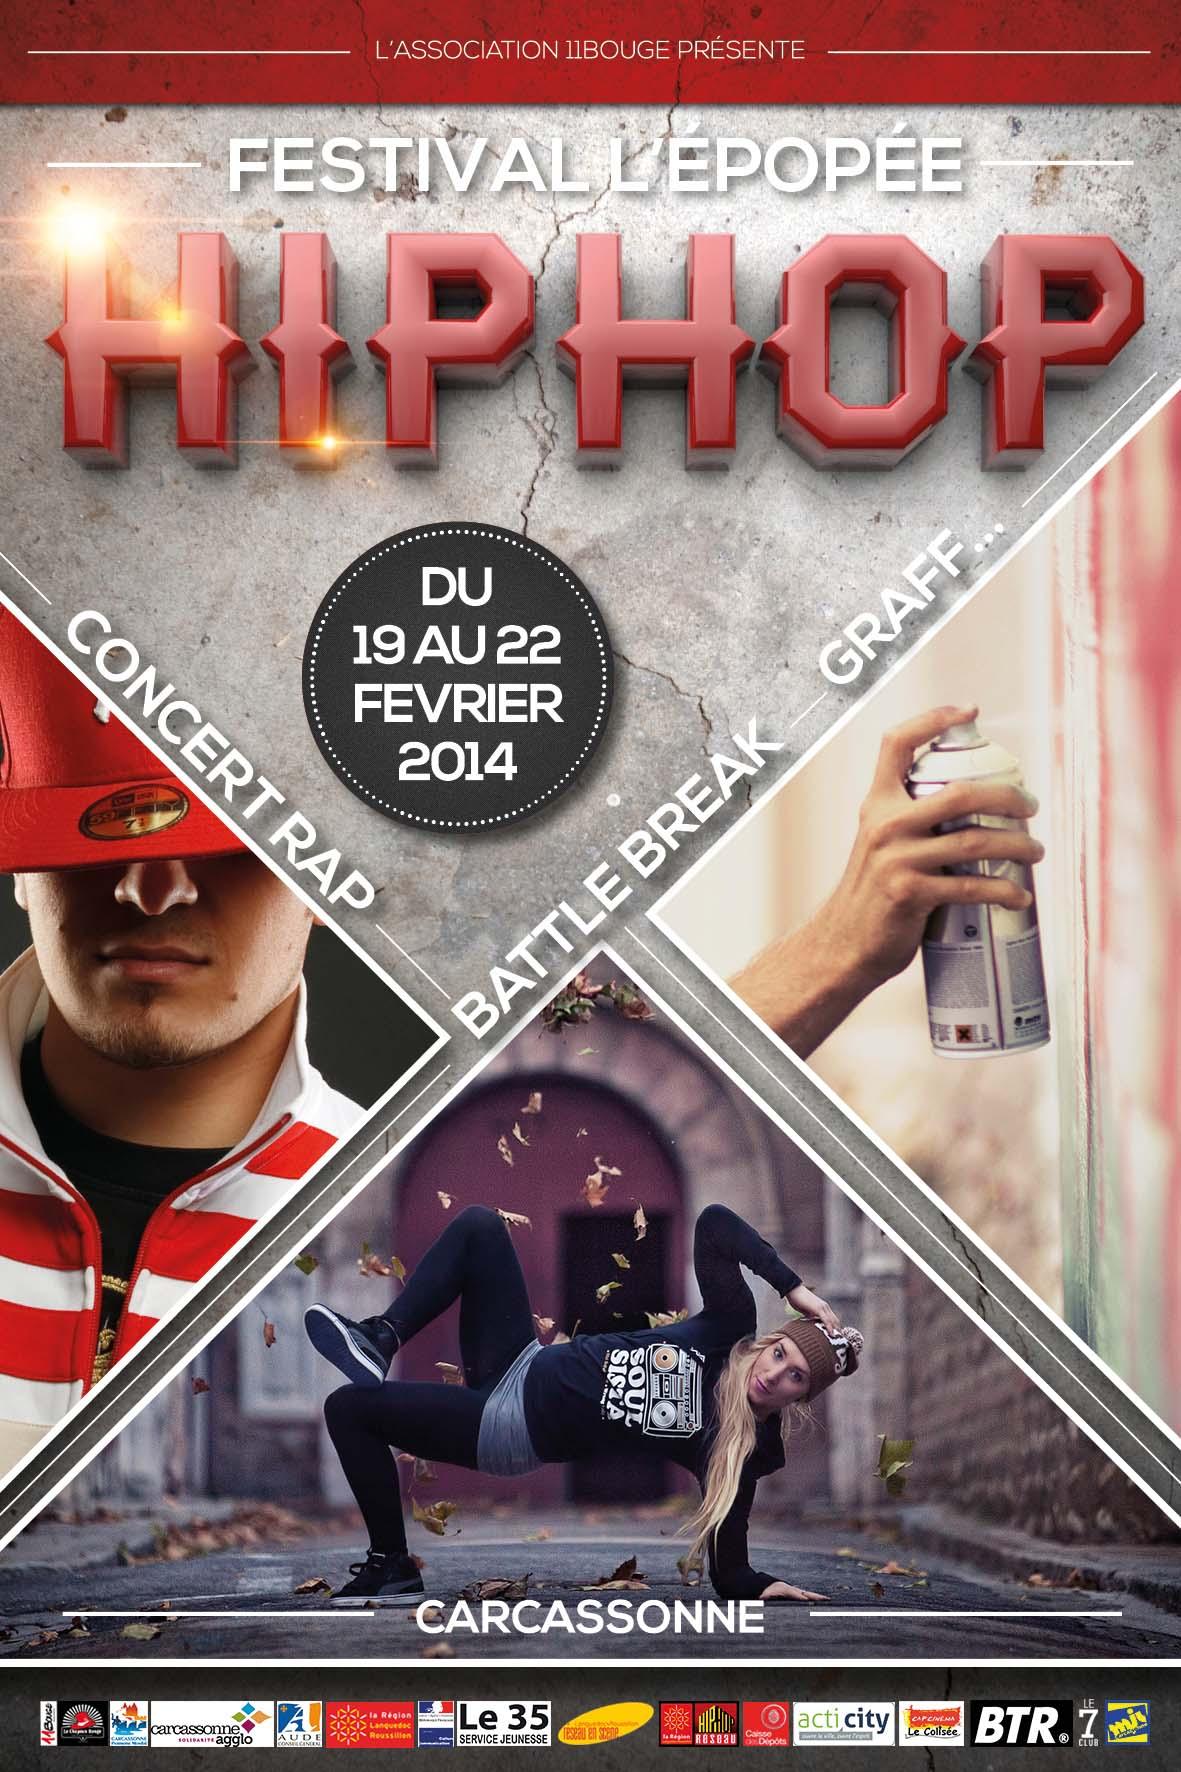 PERFORMANCE / ANTIQUARKS - NADIR BEN BRAHIM @ Festival Epopée Hip-Hop #2 | Carcassonne | Languedoc-Roussillon | France